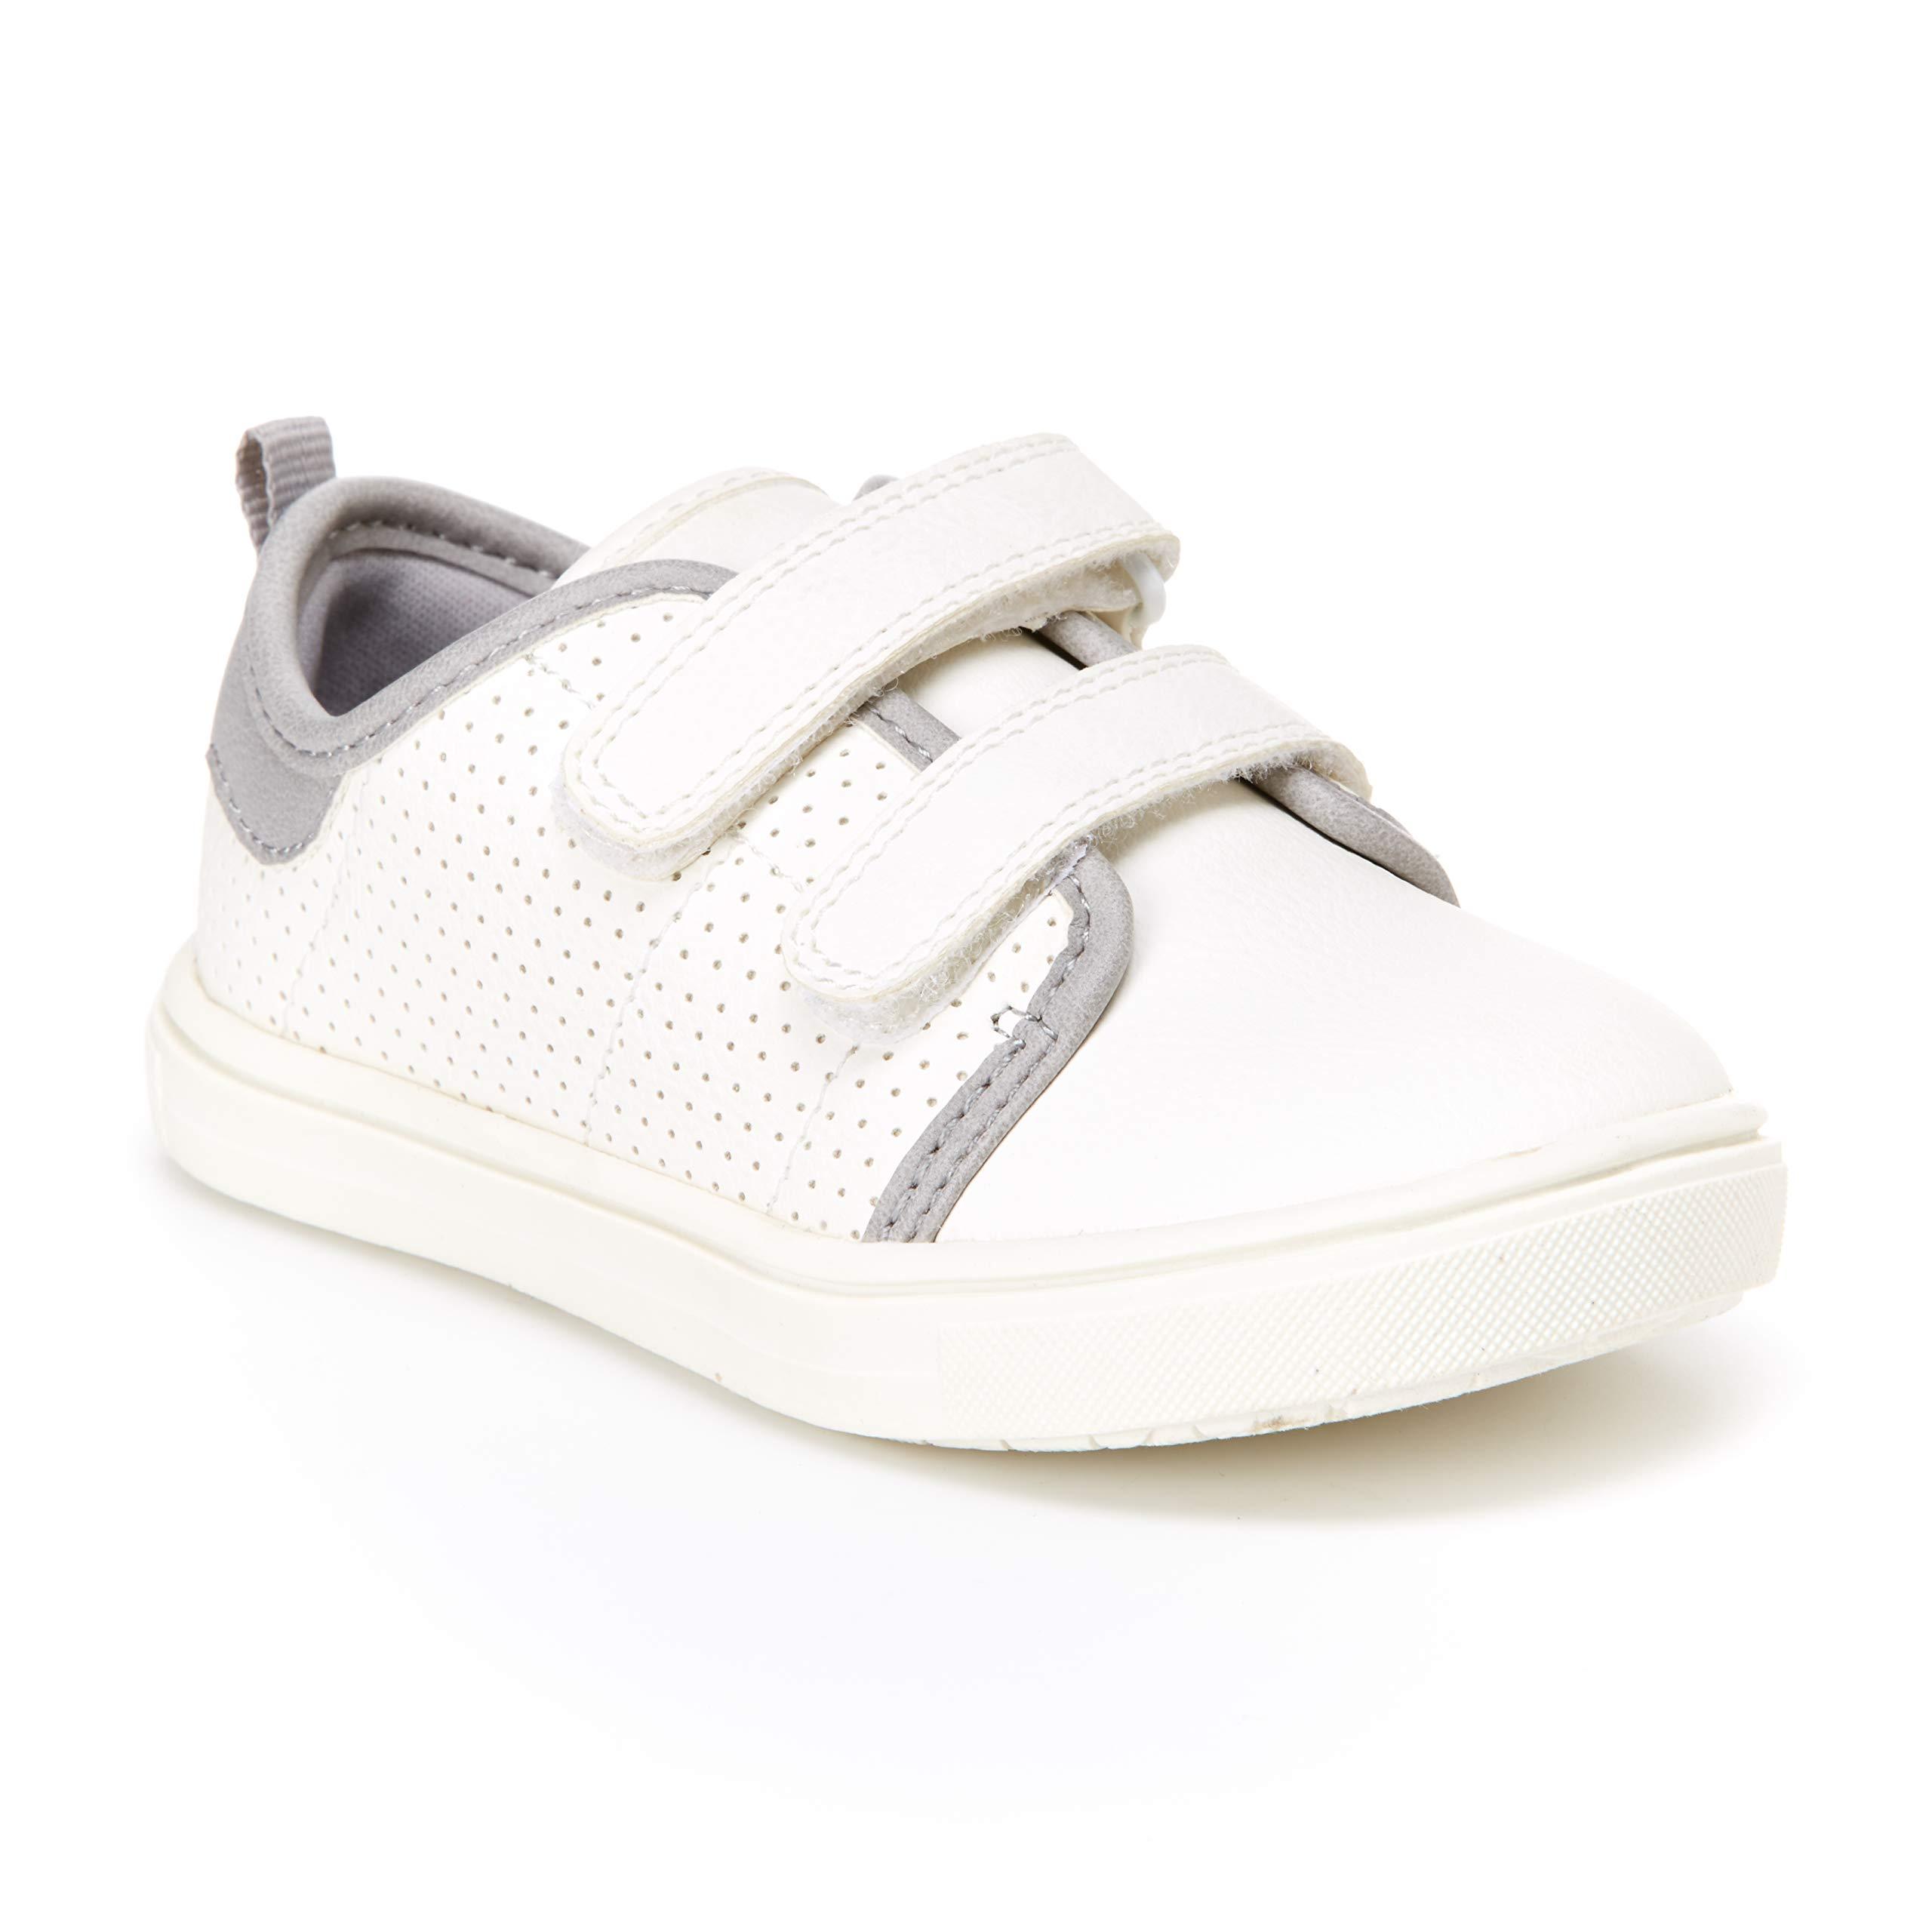 Simple Joys Carters Casual Sneaker